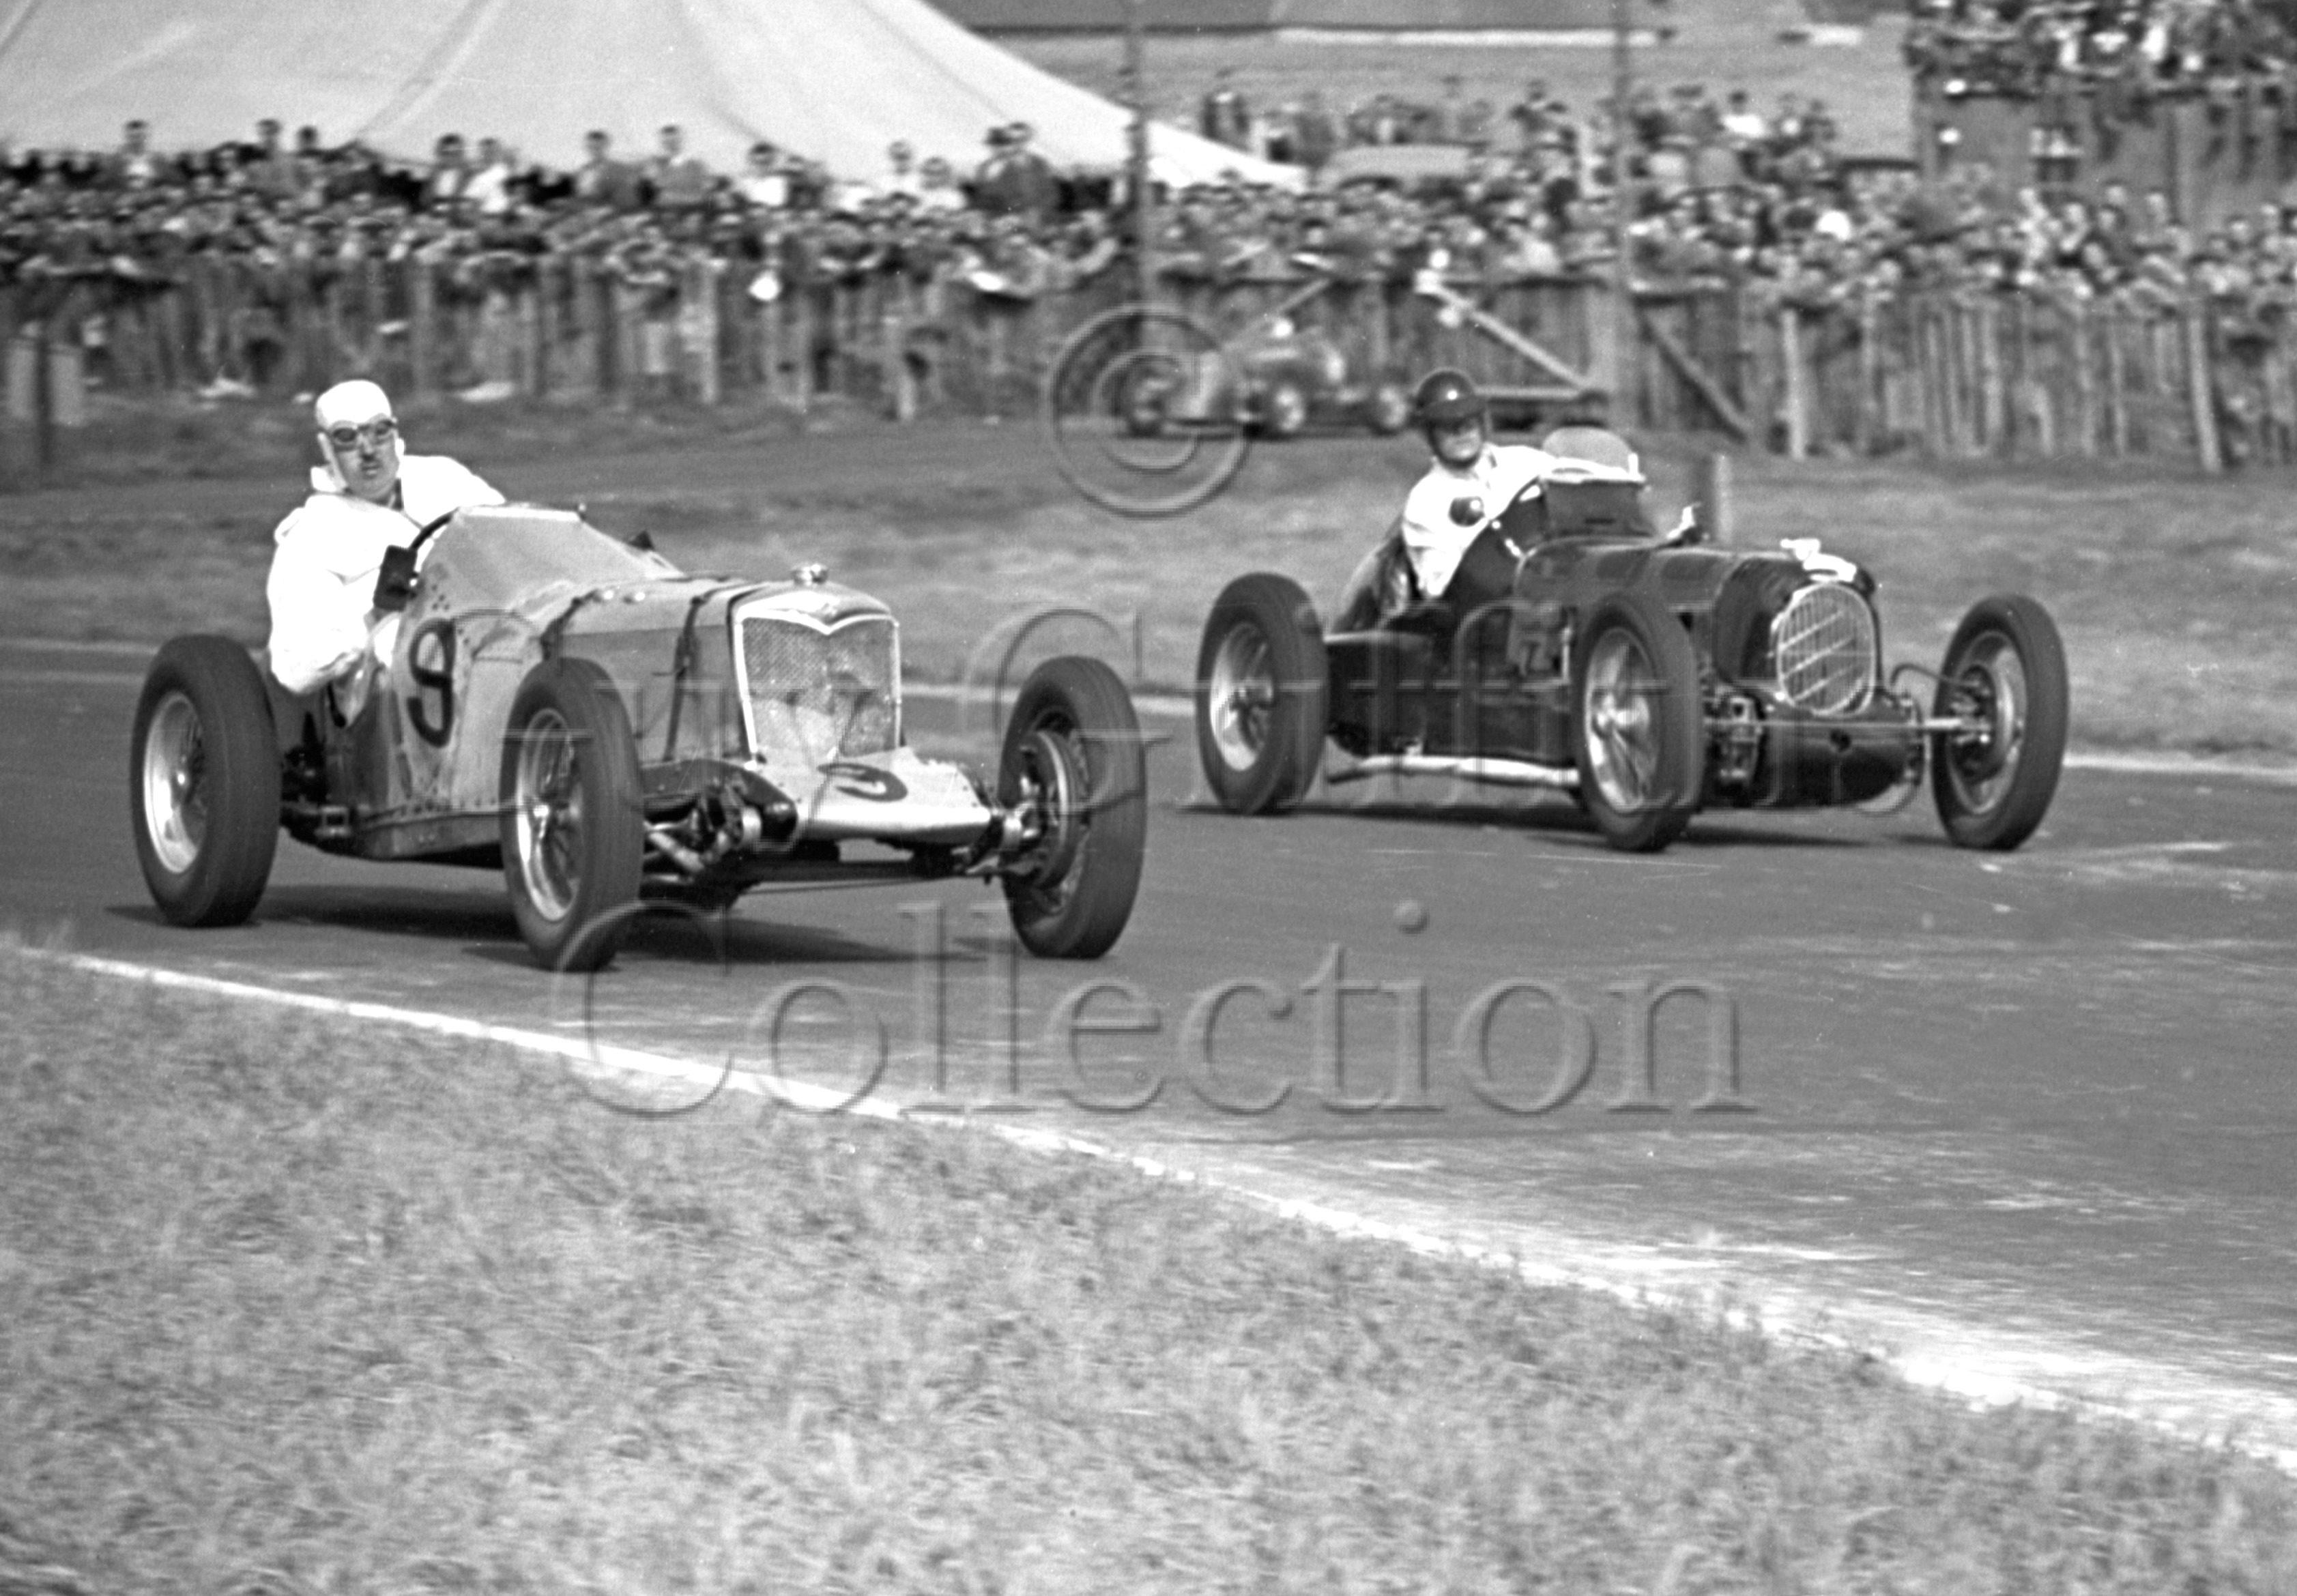 12-525–W-G-Bingley–Aston-Martin—H-J-Ripley–Riley—Goodwood–18-04-1949.jpg - The Guy Griffiths Collection